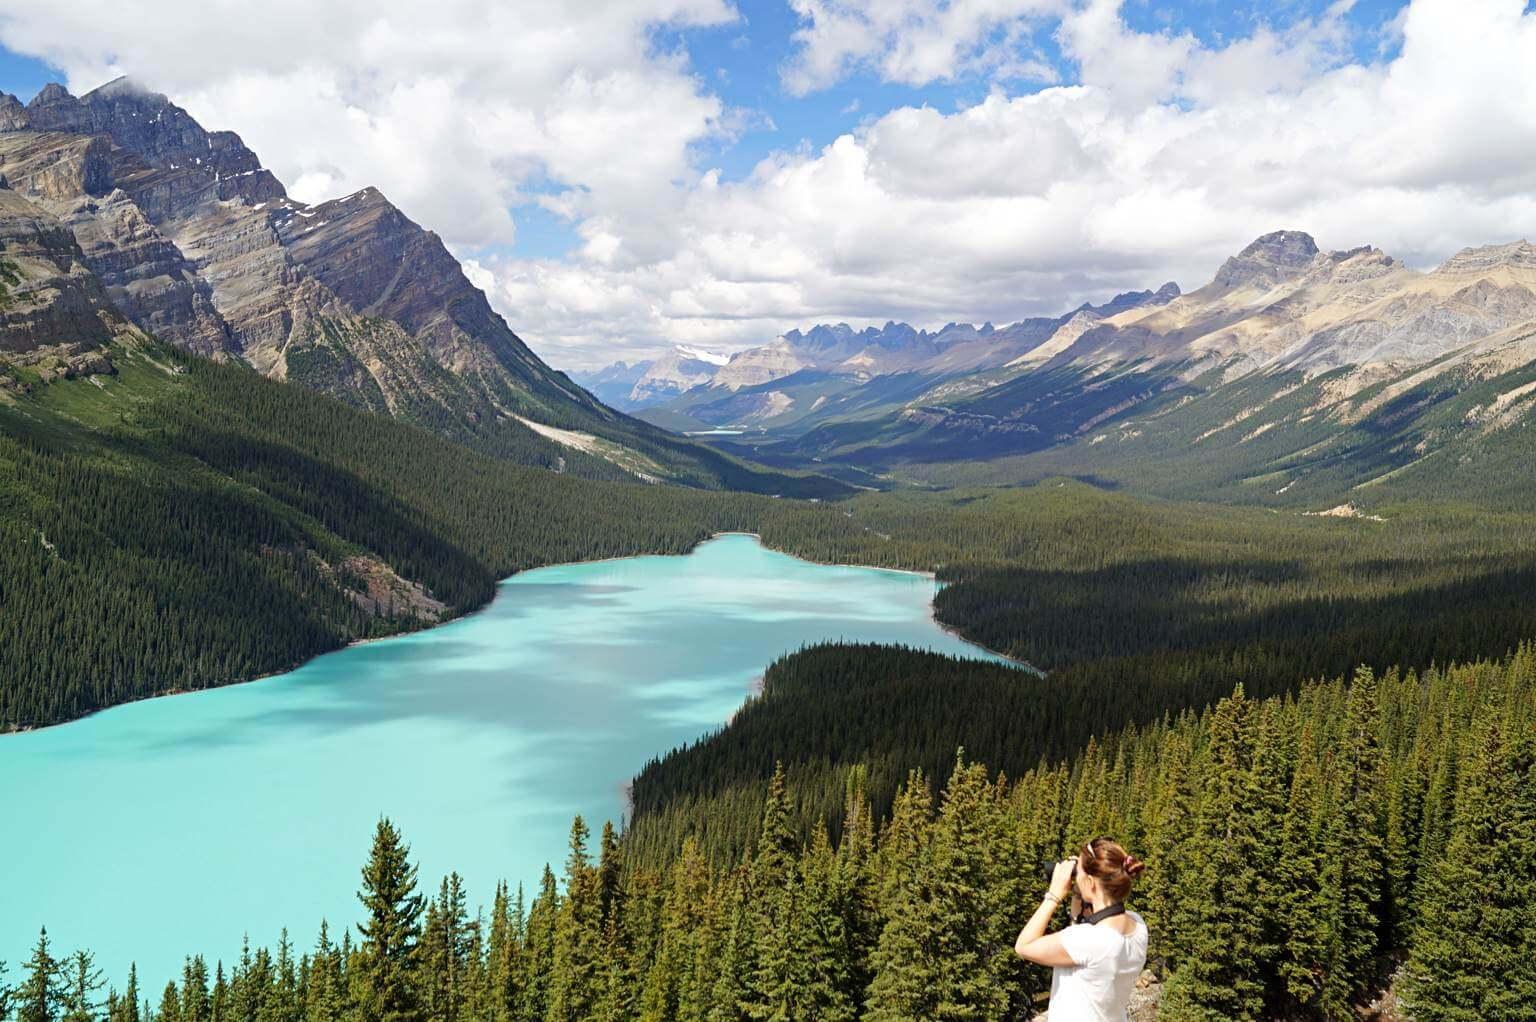 Blick in die Ferne am Peyto Lake, Banff National Park, Kanada